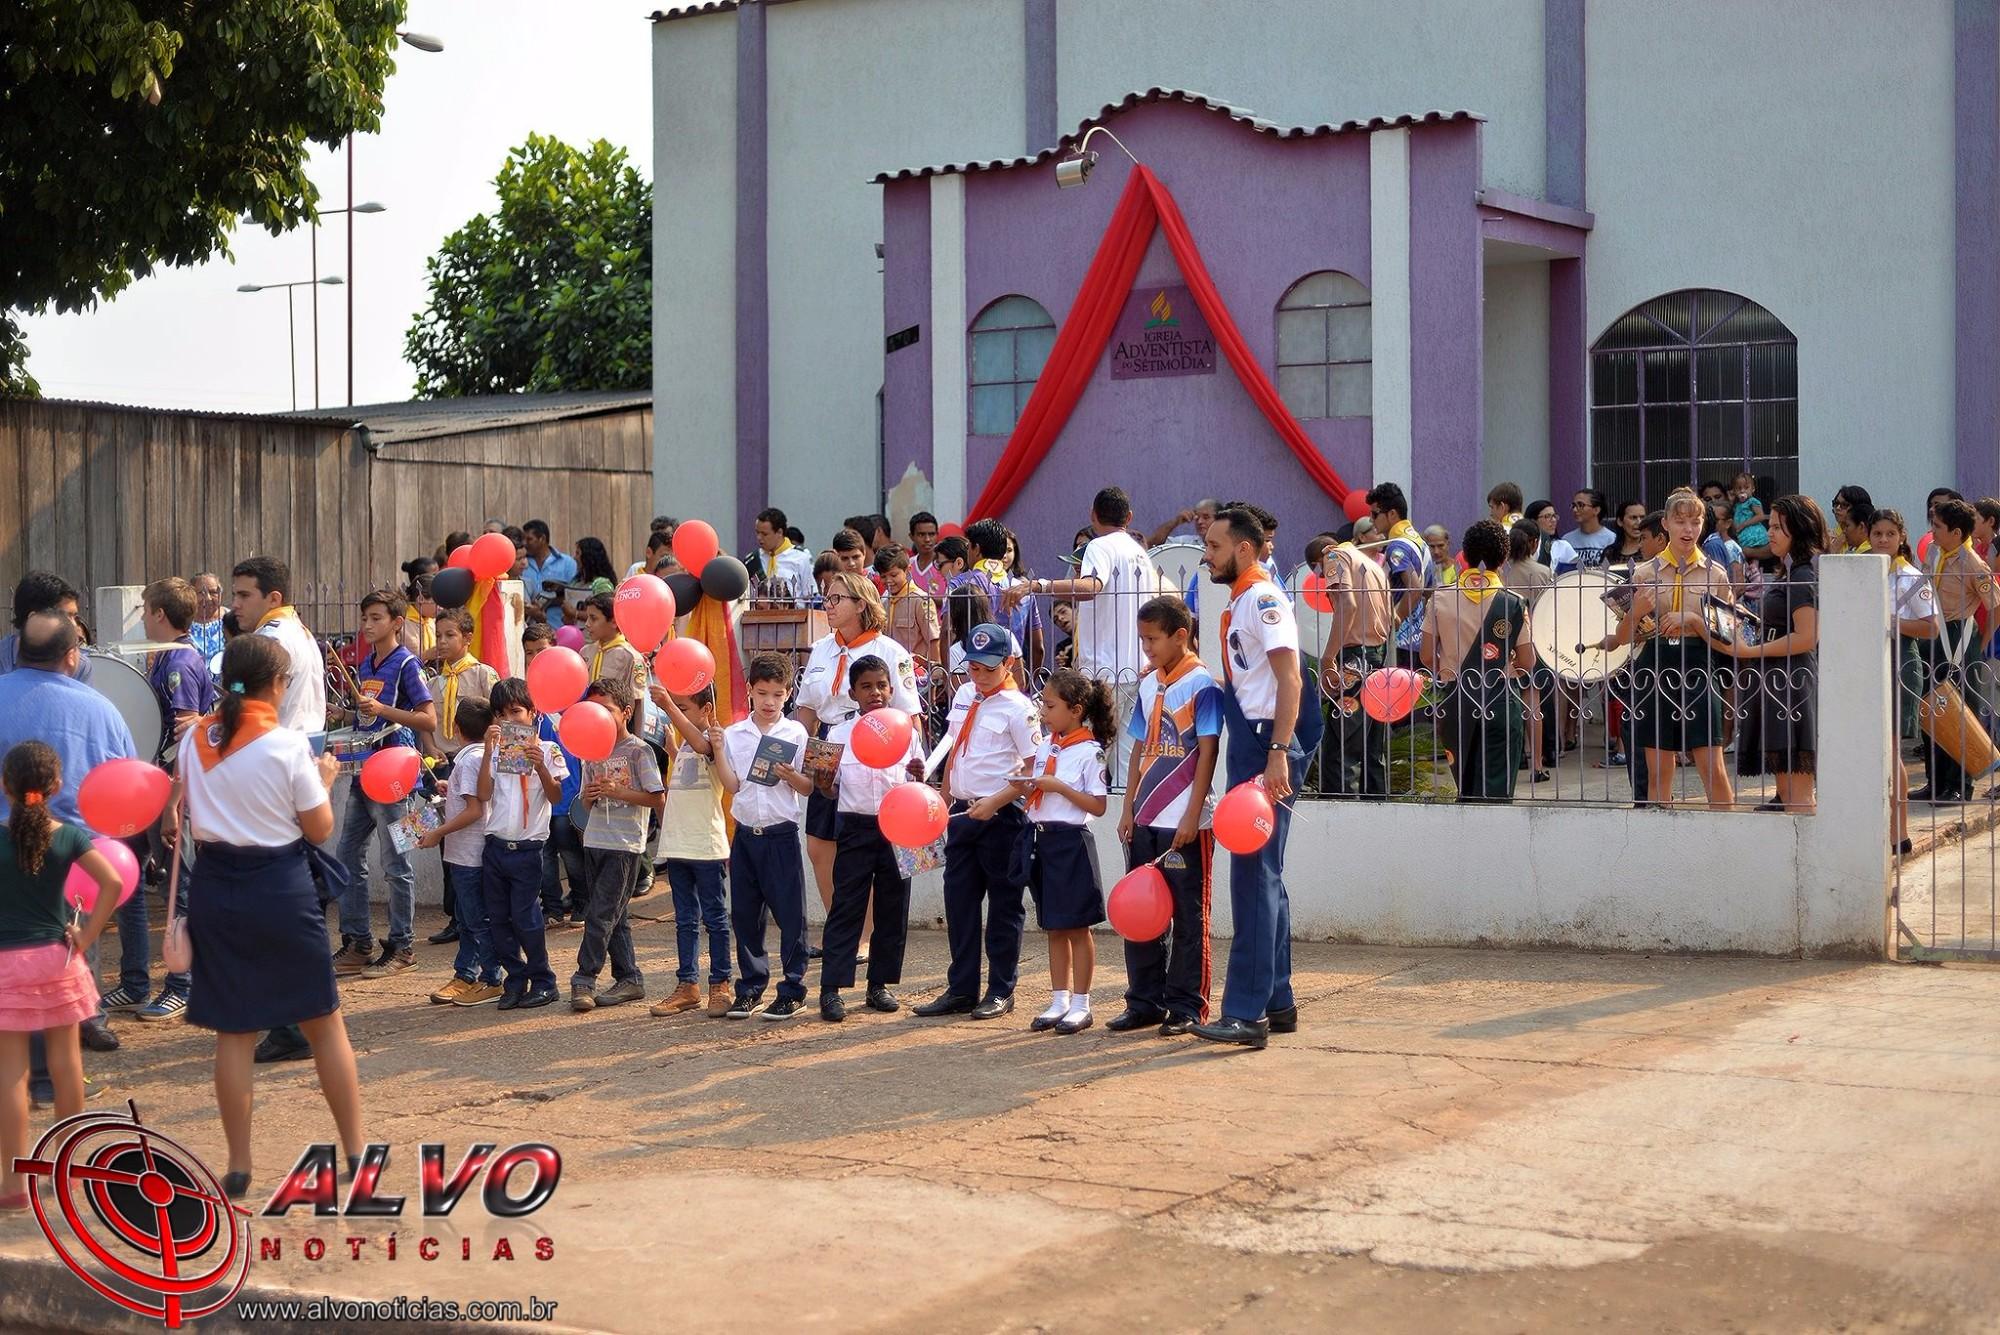 Igreja Adventista - Passeata